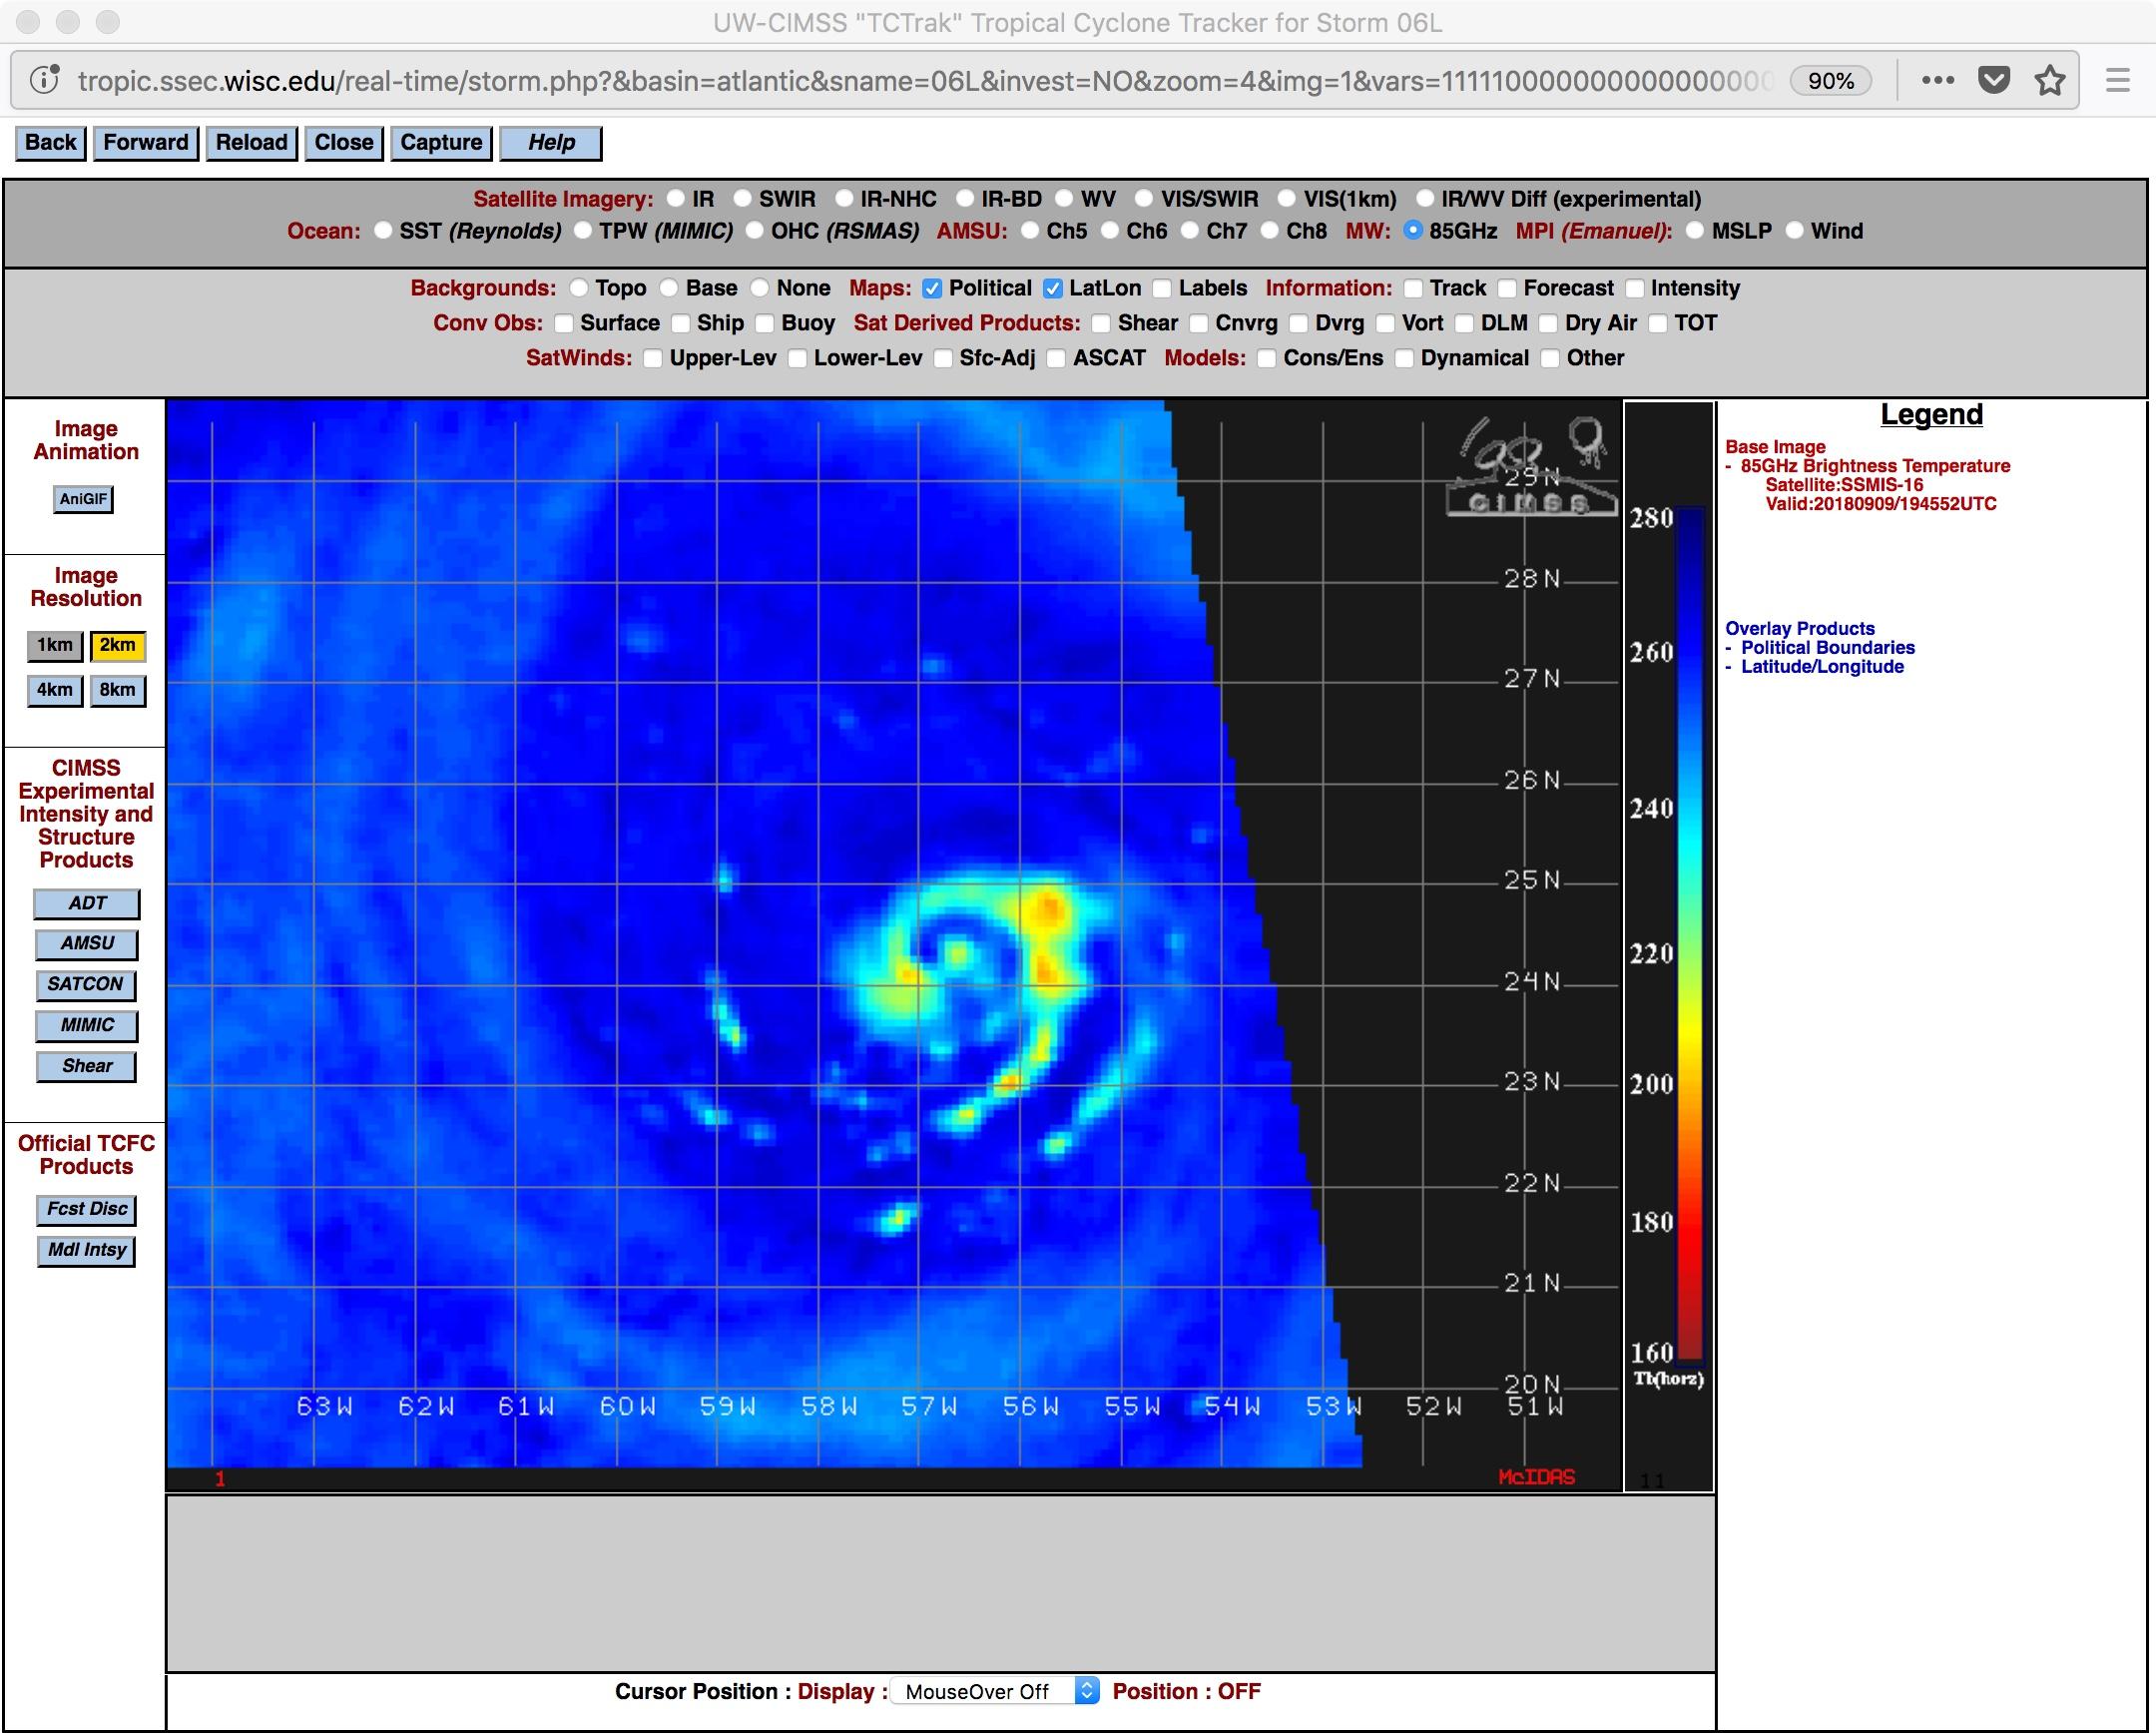 DMSP-16 SSMIS Microwave (85 GHz) image at 1845 UTC [click to enlarge]